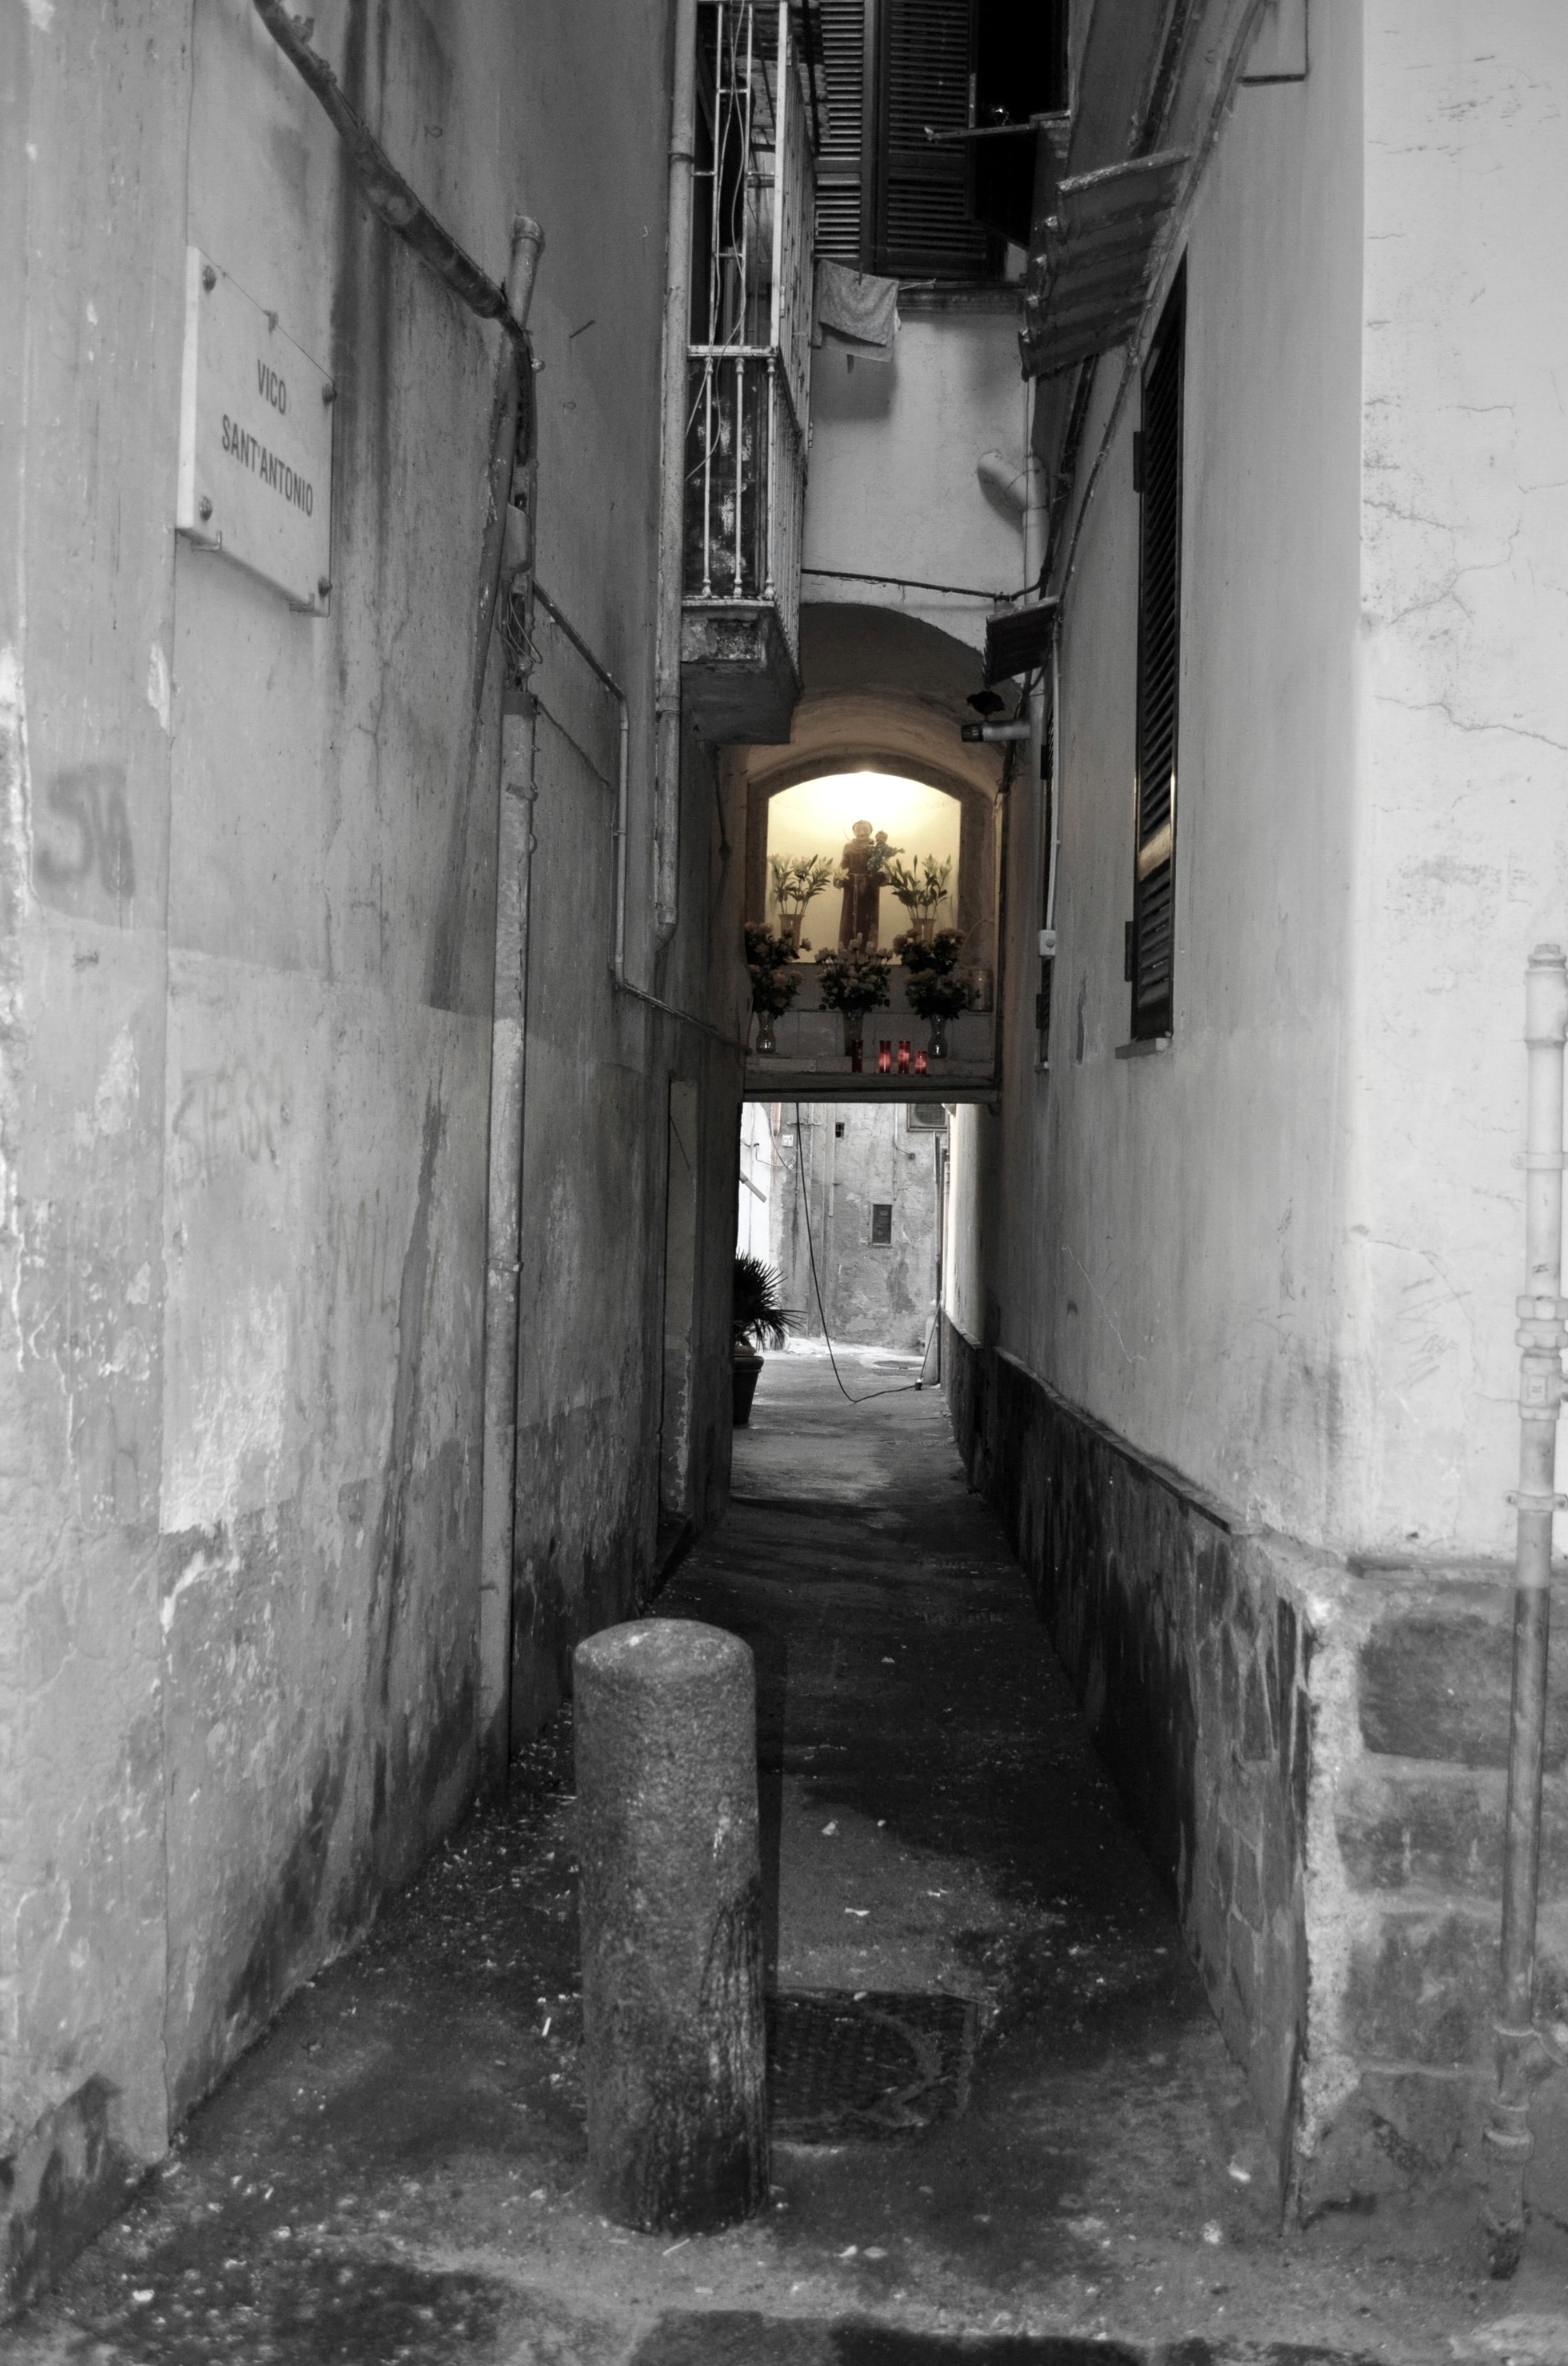 Vico Sant'Antonio